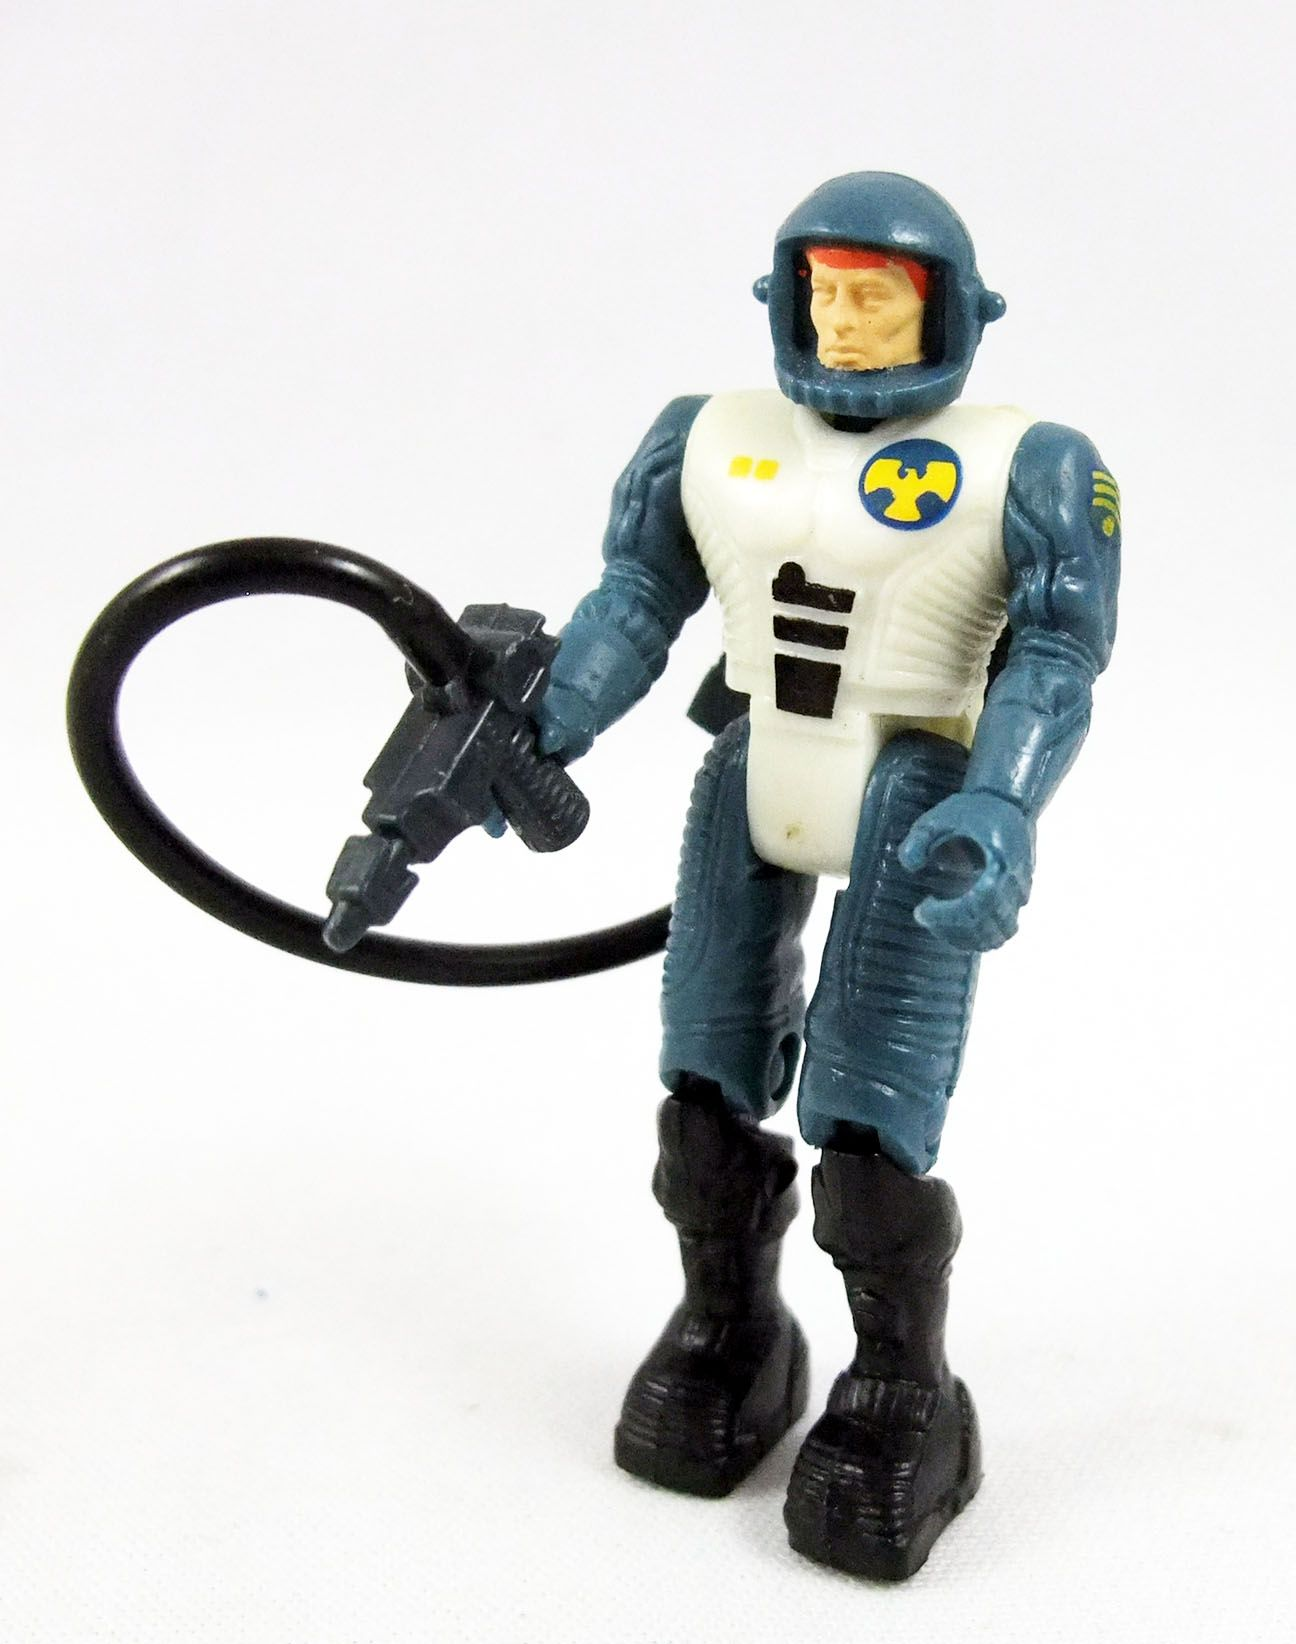 Starcom - Coleco - Sgt. Red Baker (loose)